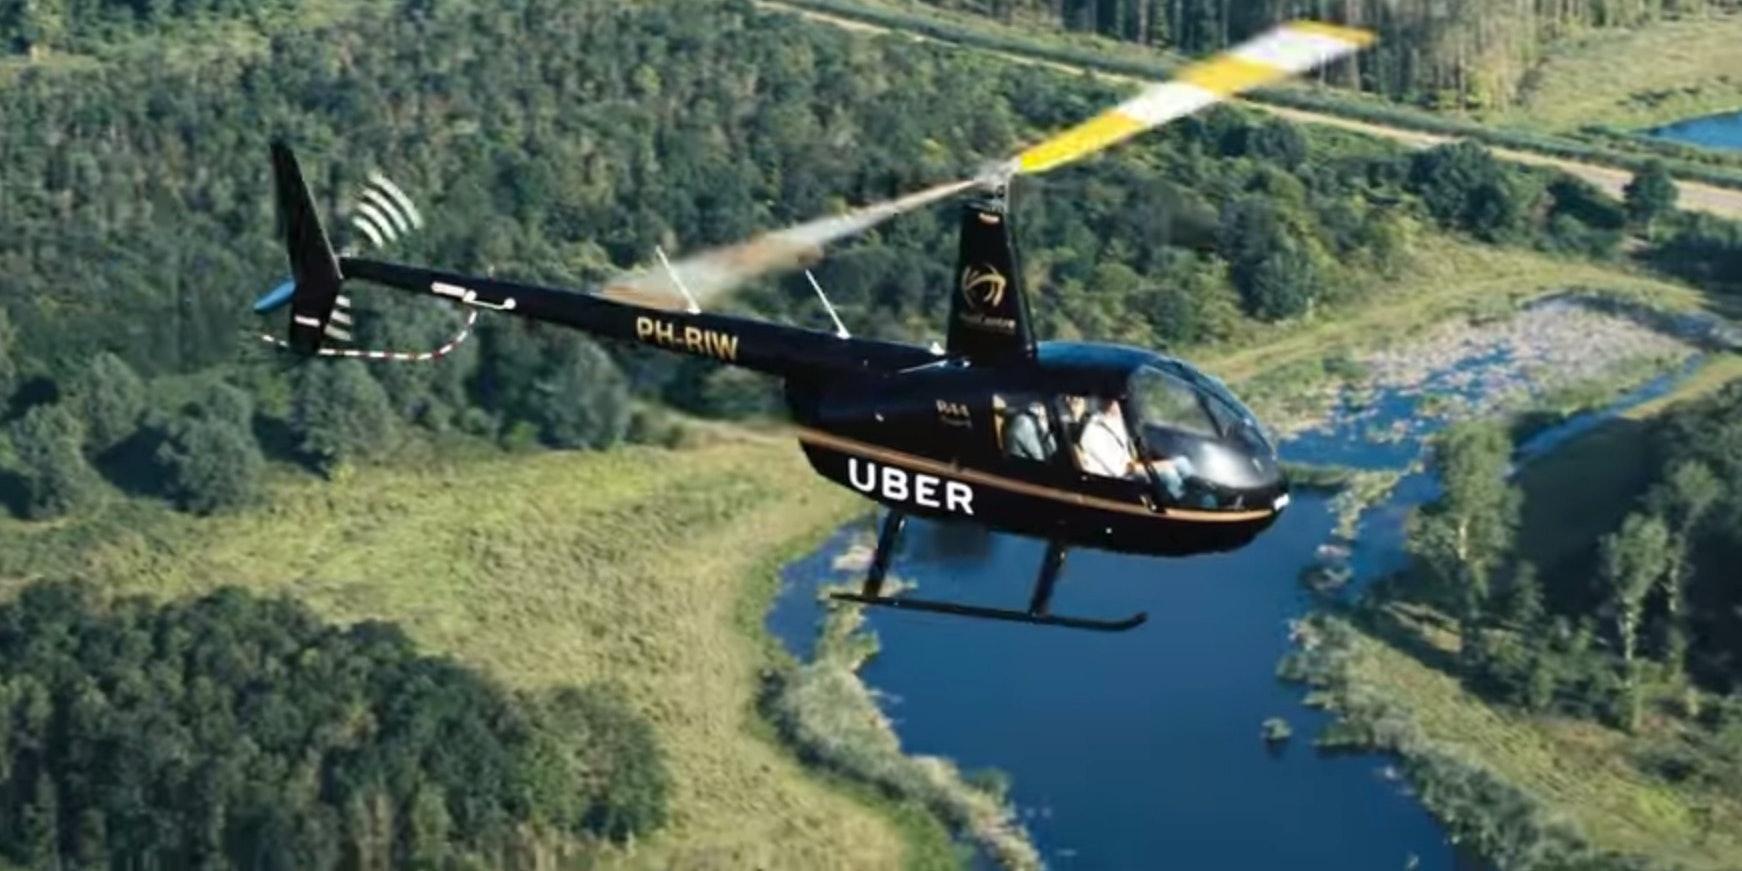 Screenshot from the UberCHOPPER movie